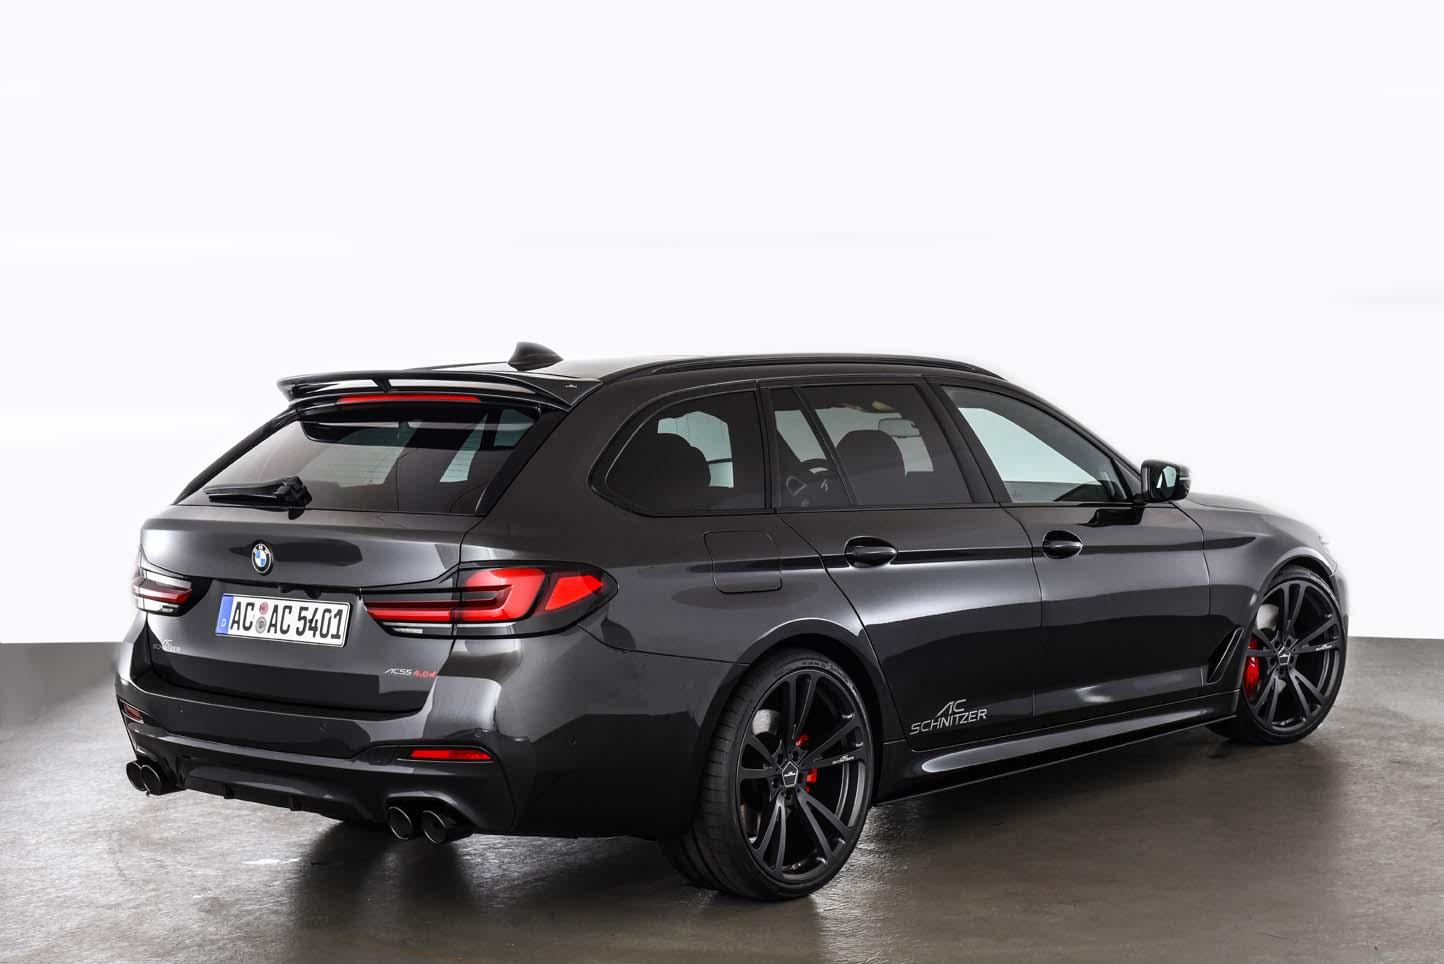 BMW_5-Series_facelift_AC_Schnitzer_0011